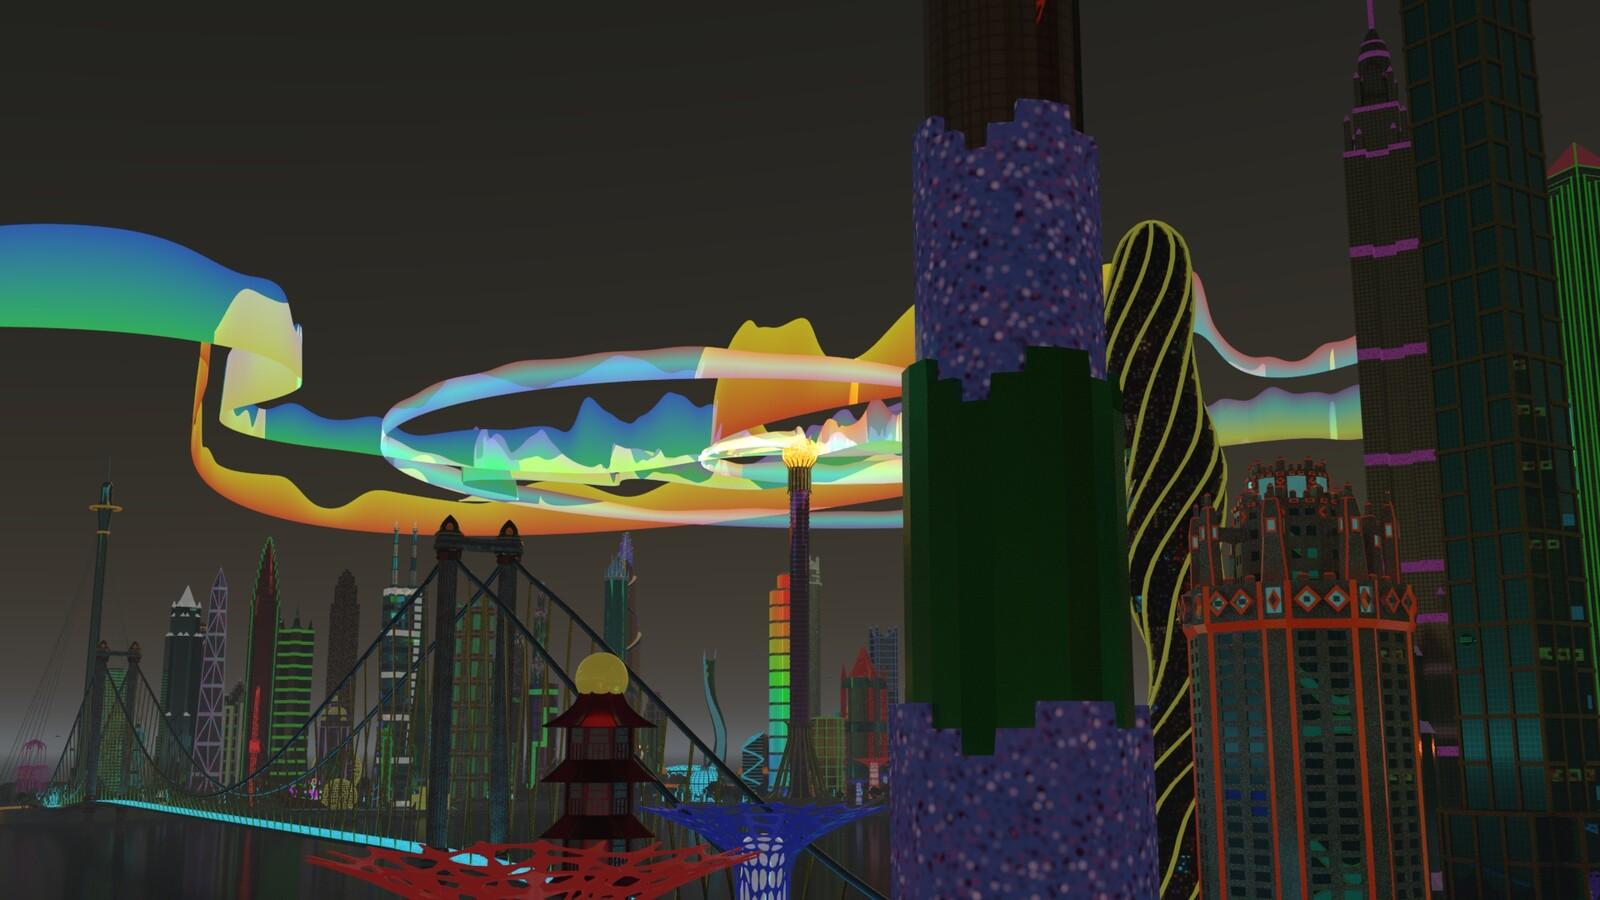 Light Tower aurora show